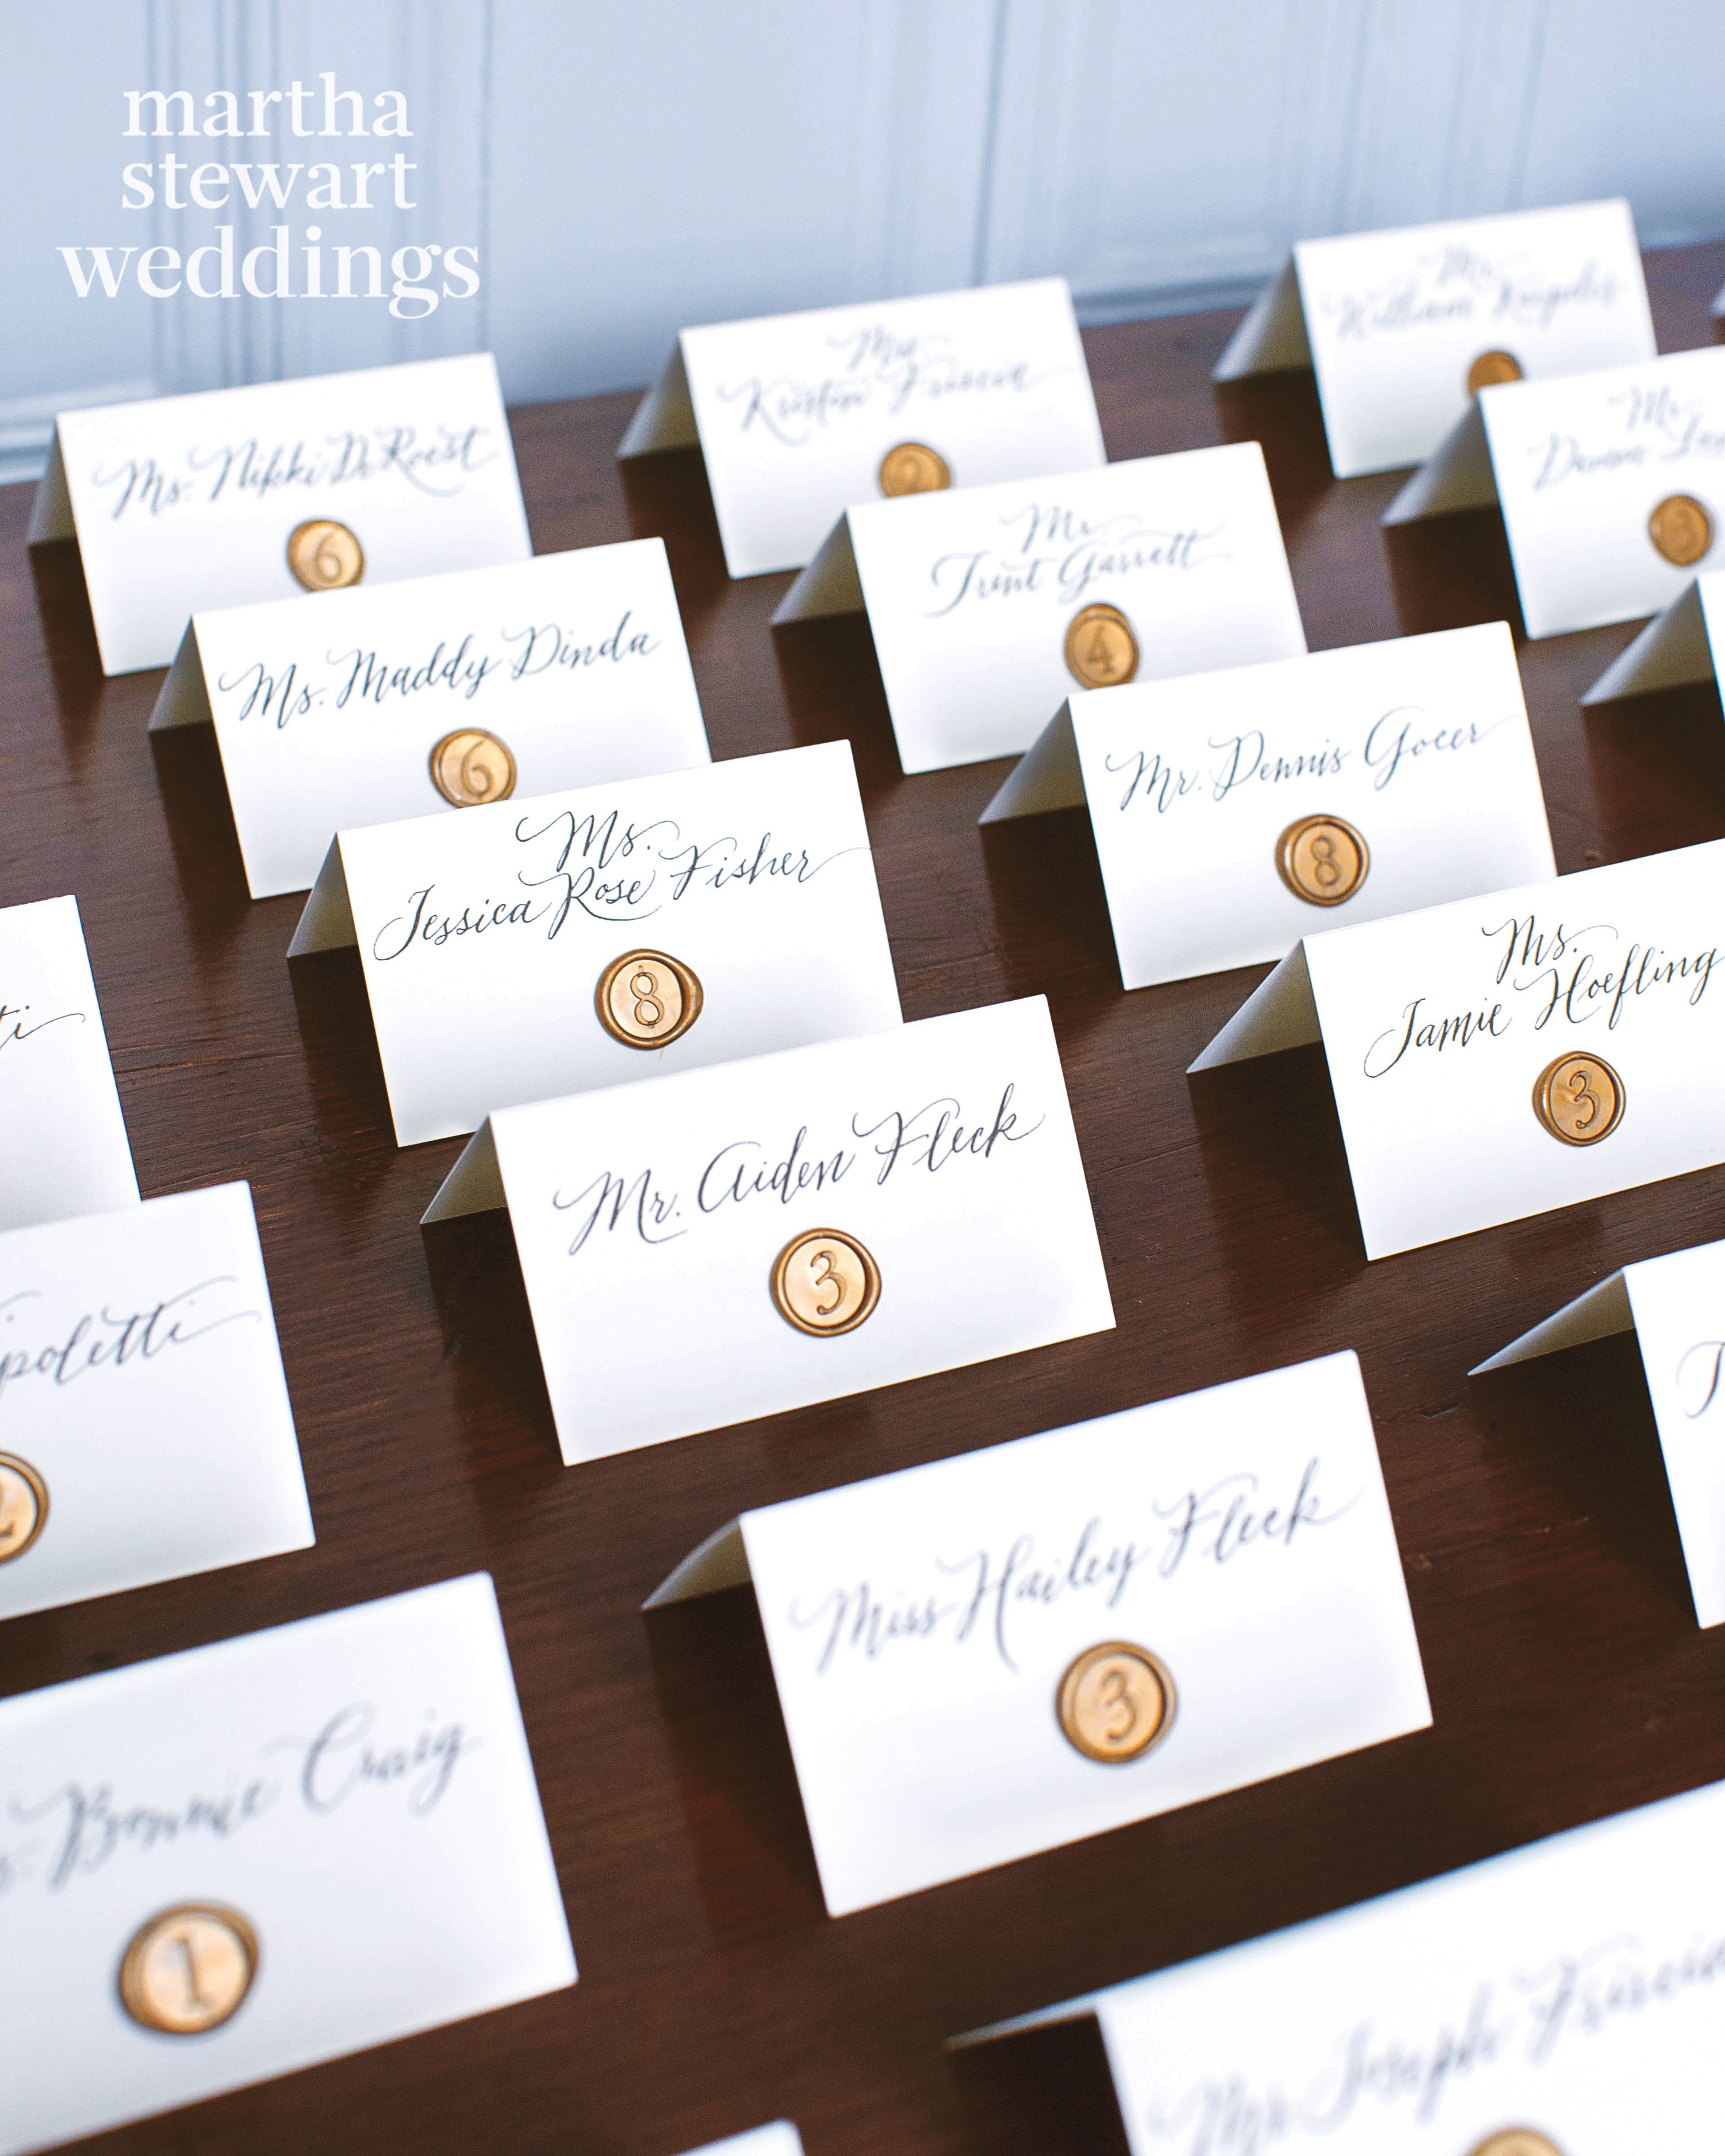 jenny-freddie-wedding-france-203-d112242-watermarked-1215.jpg